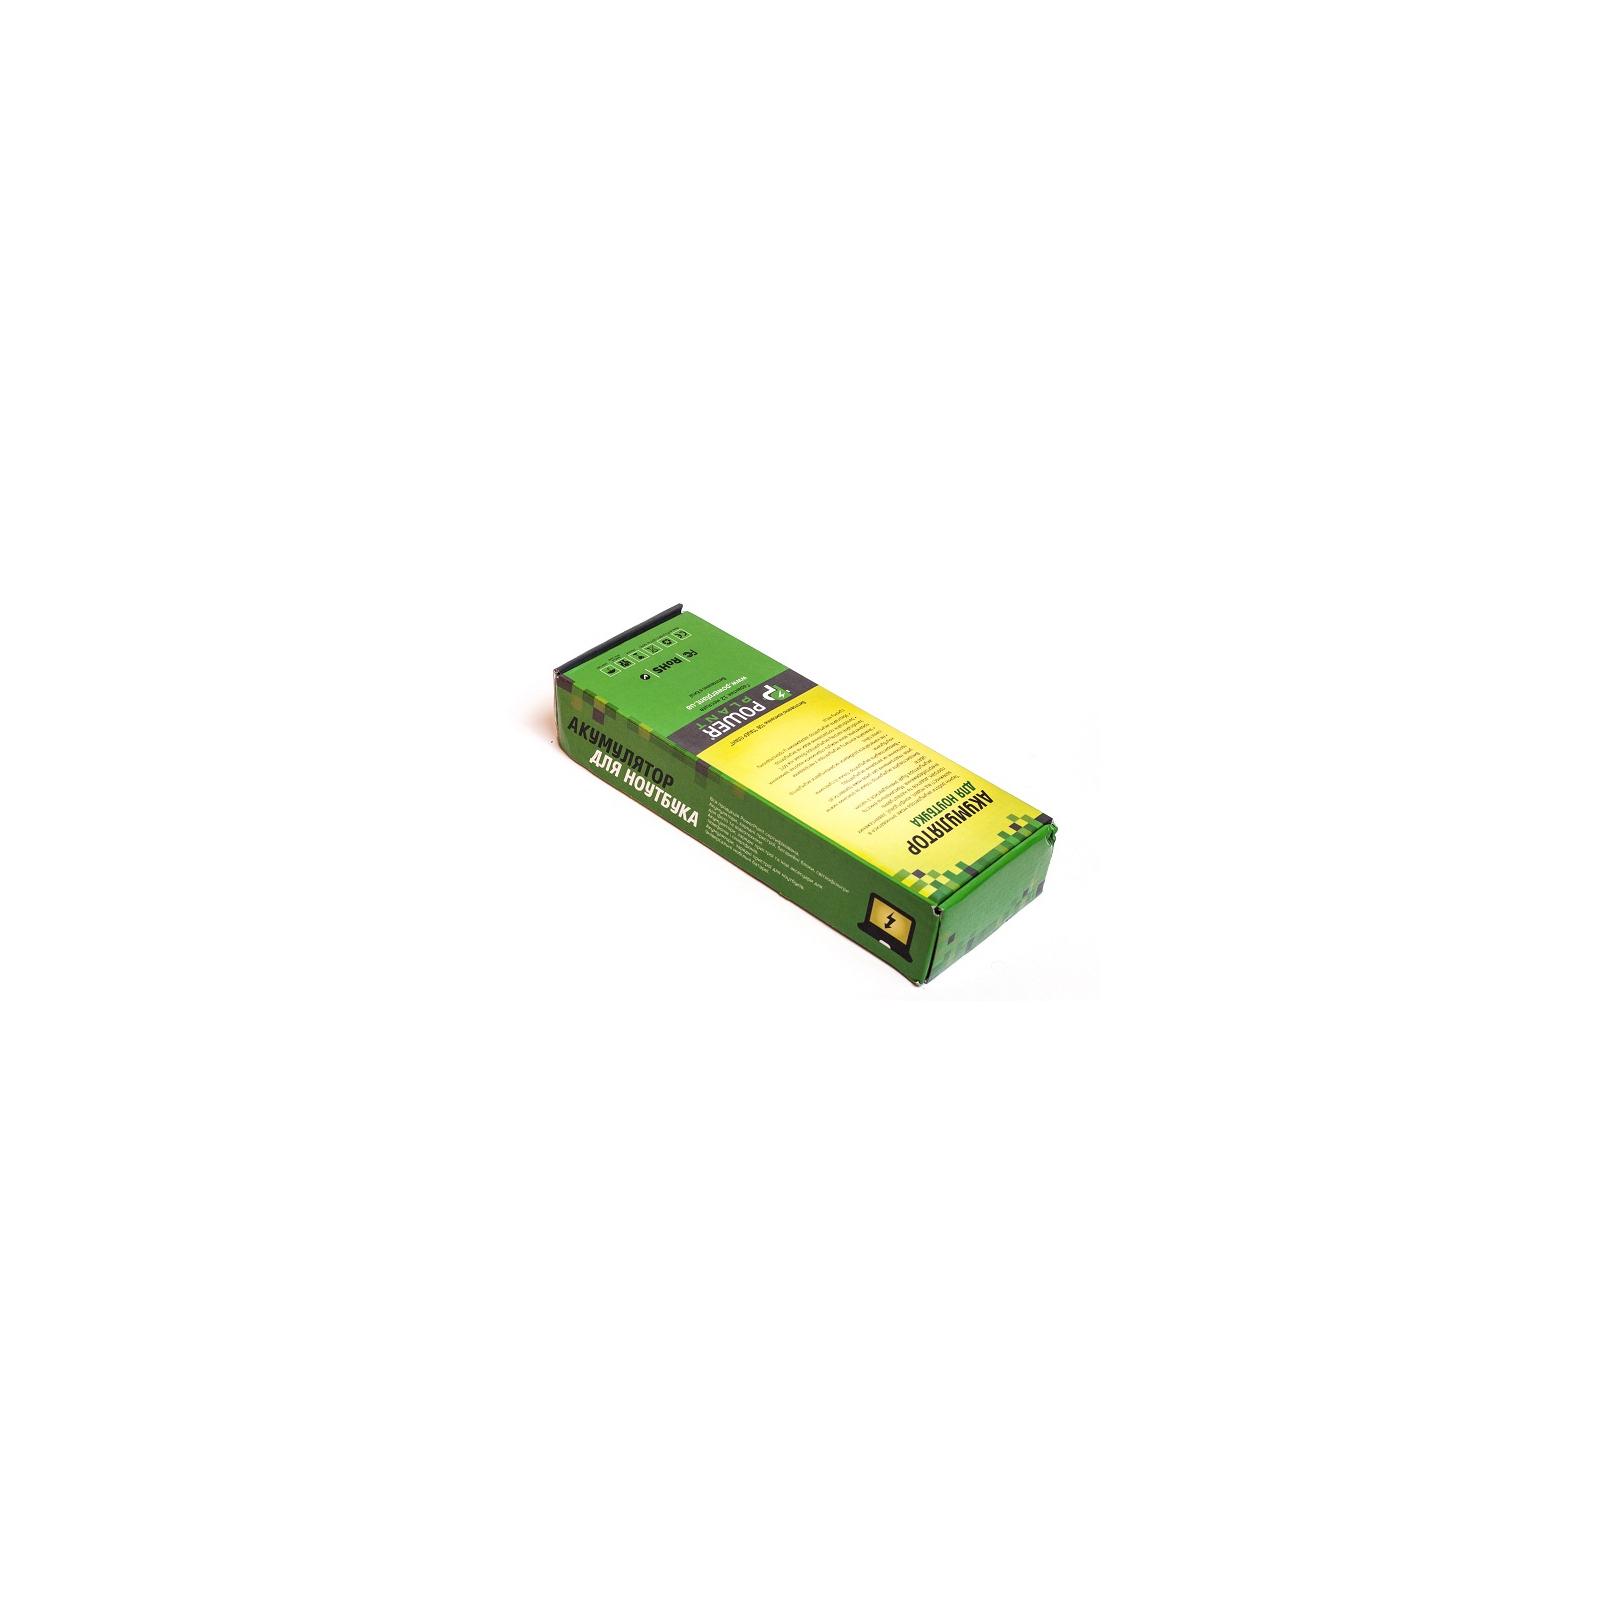 Аккумулятор для ноутбука HP CQ14 OA04 (HSTNN-LB5Y) 14.8V 2600mAh PowerPlant (NB00000295) изображение 2